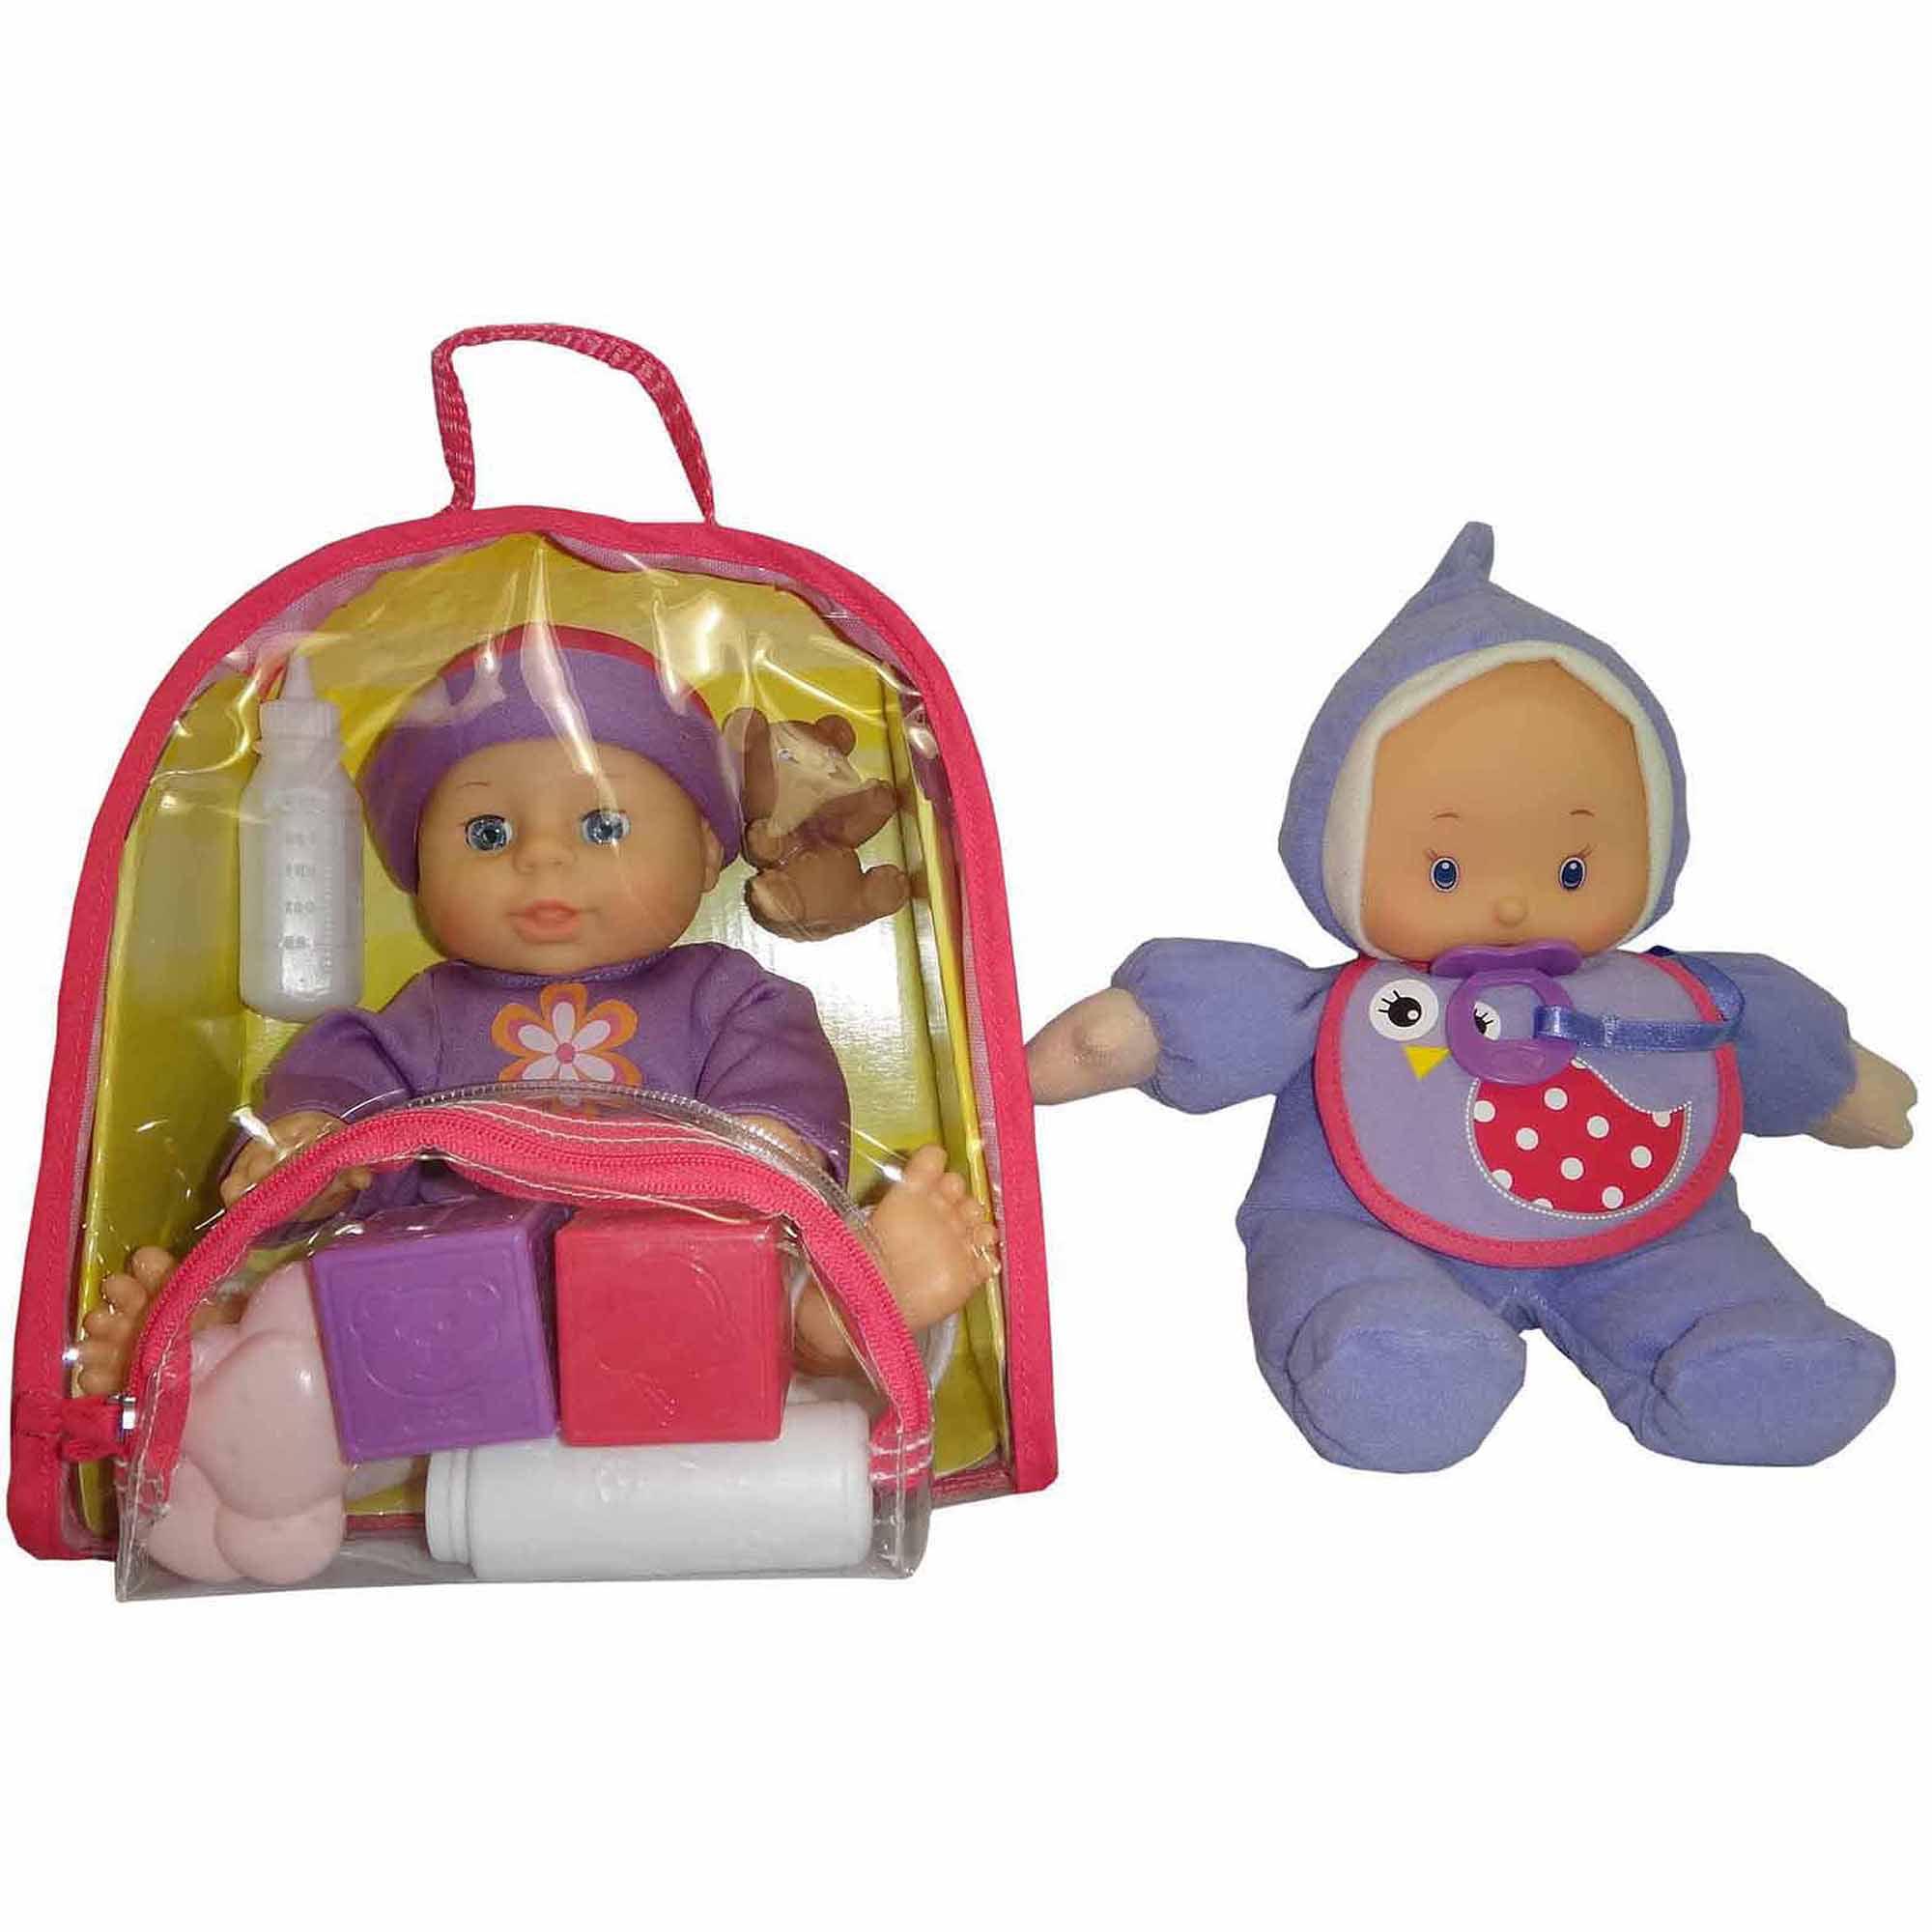 2a986c857060 My Sweet Love Backpack Baby - Walmart.com